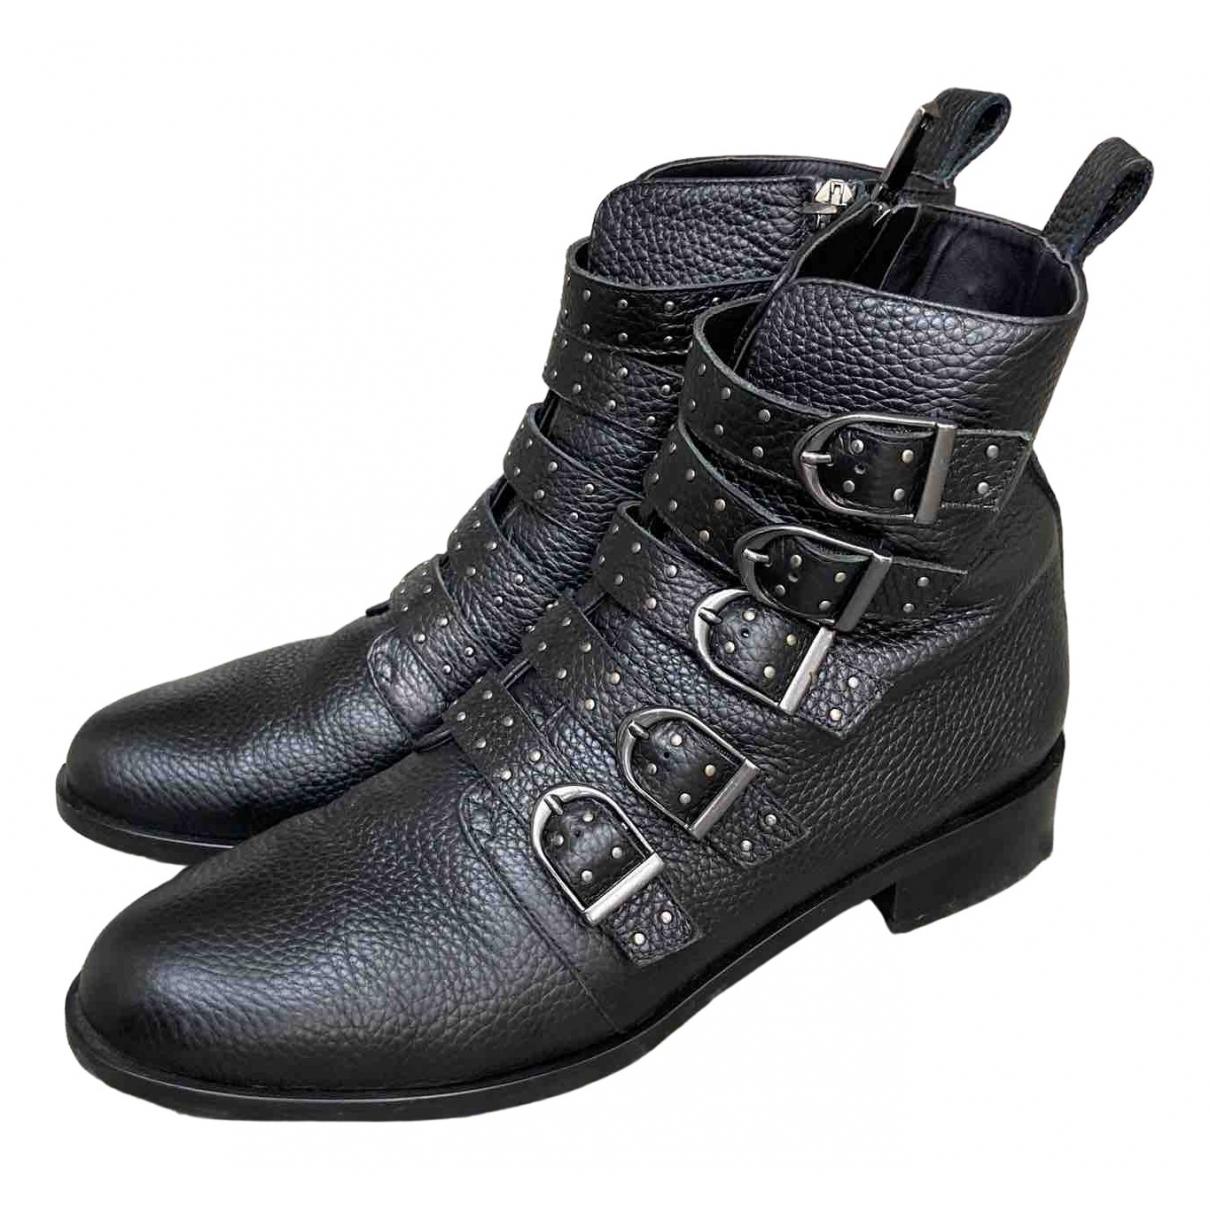 Karen Millen \N Black Leather Boots for Women 41 EU